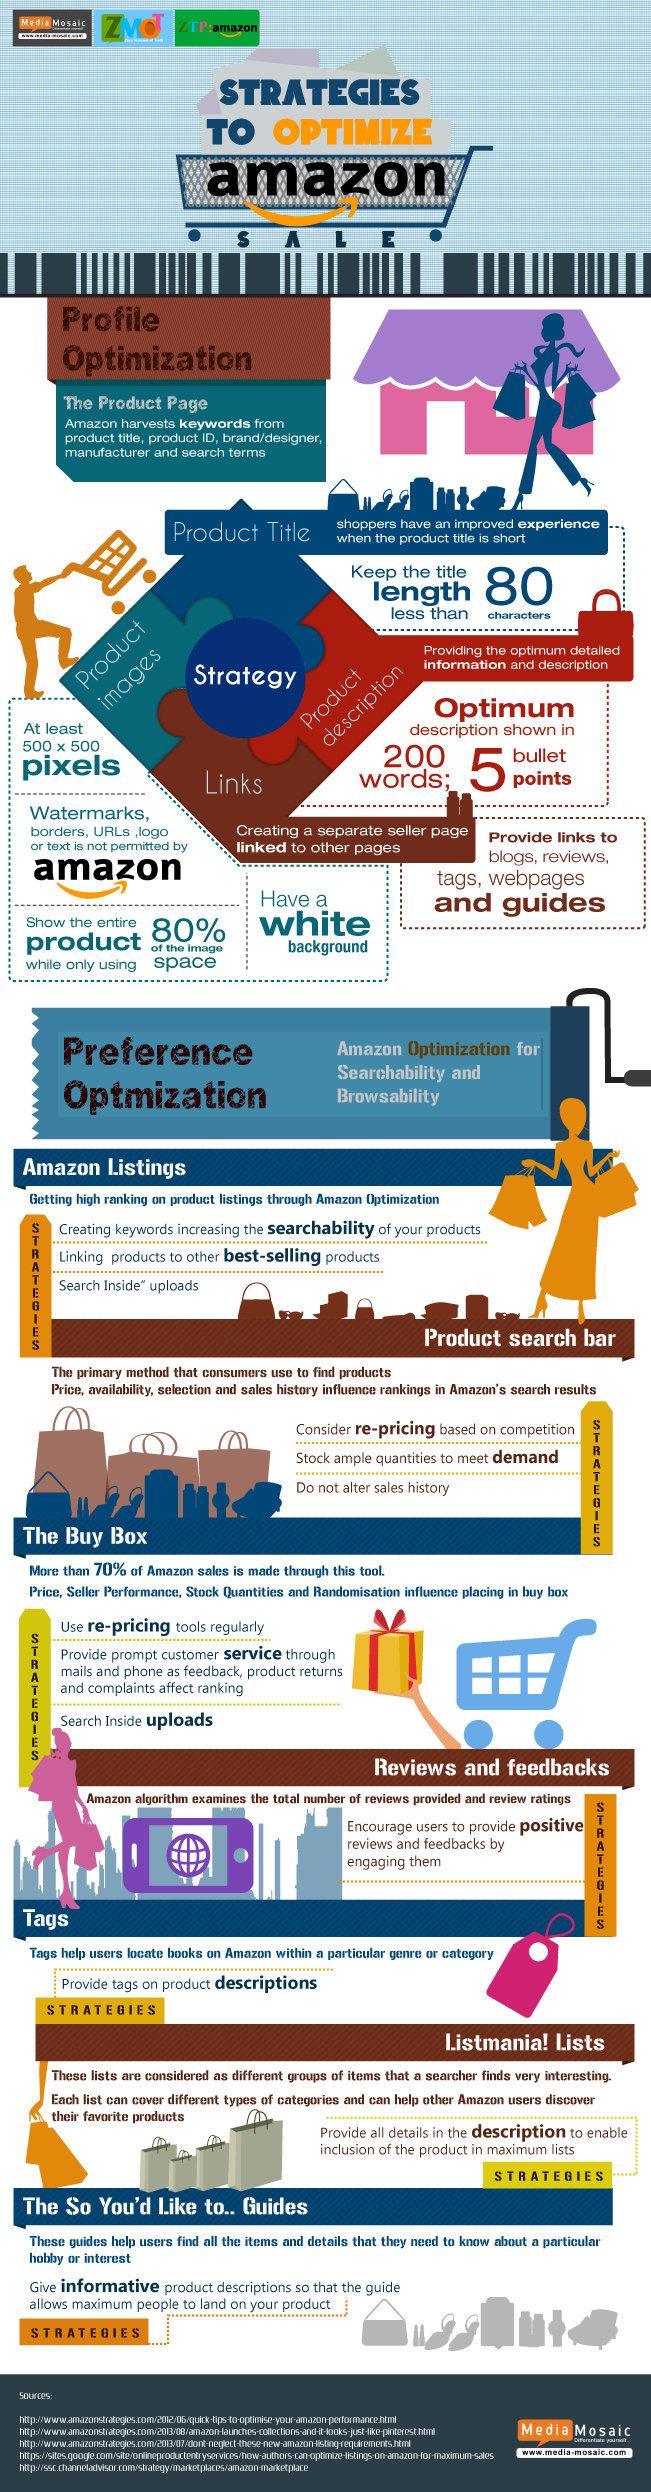 Amazon-Central-Seller-Account